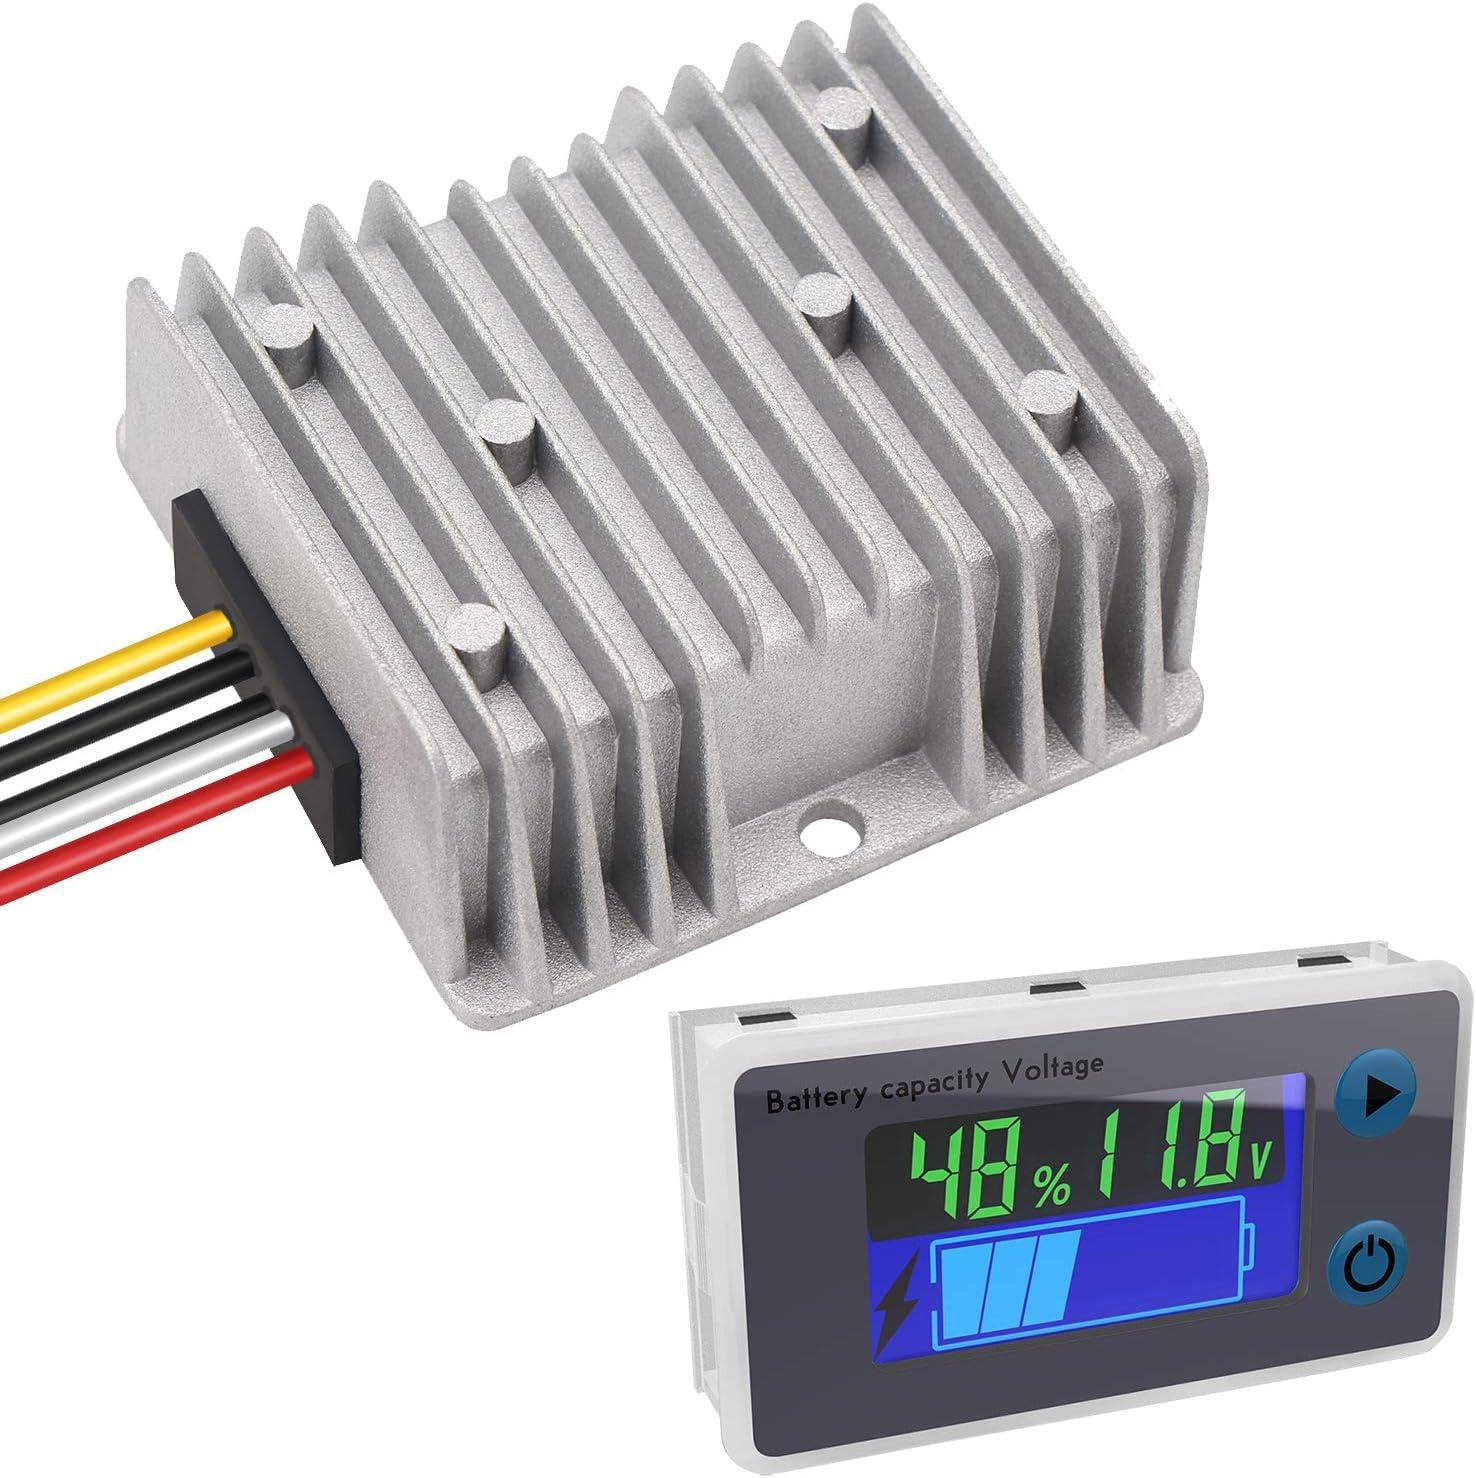 DROK 10-100V Battery Monitor and DC 10-40V to 5V Buck Converter Bundle